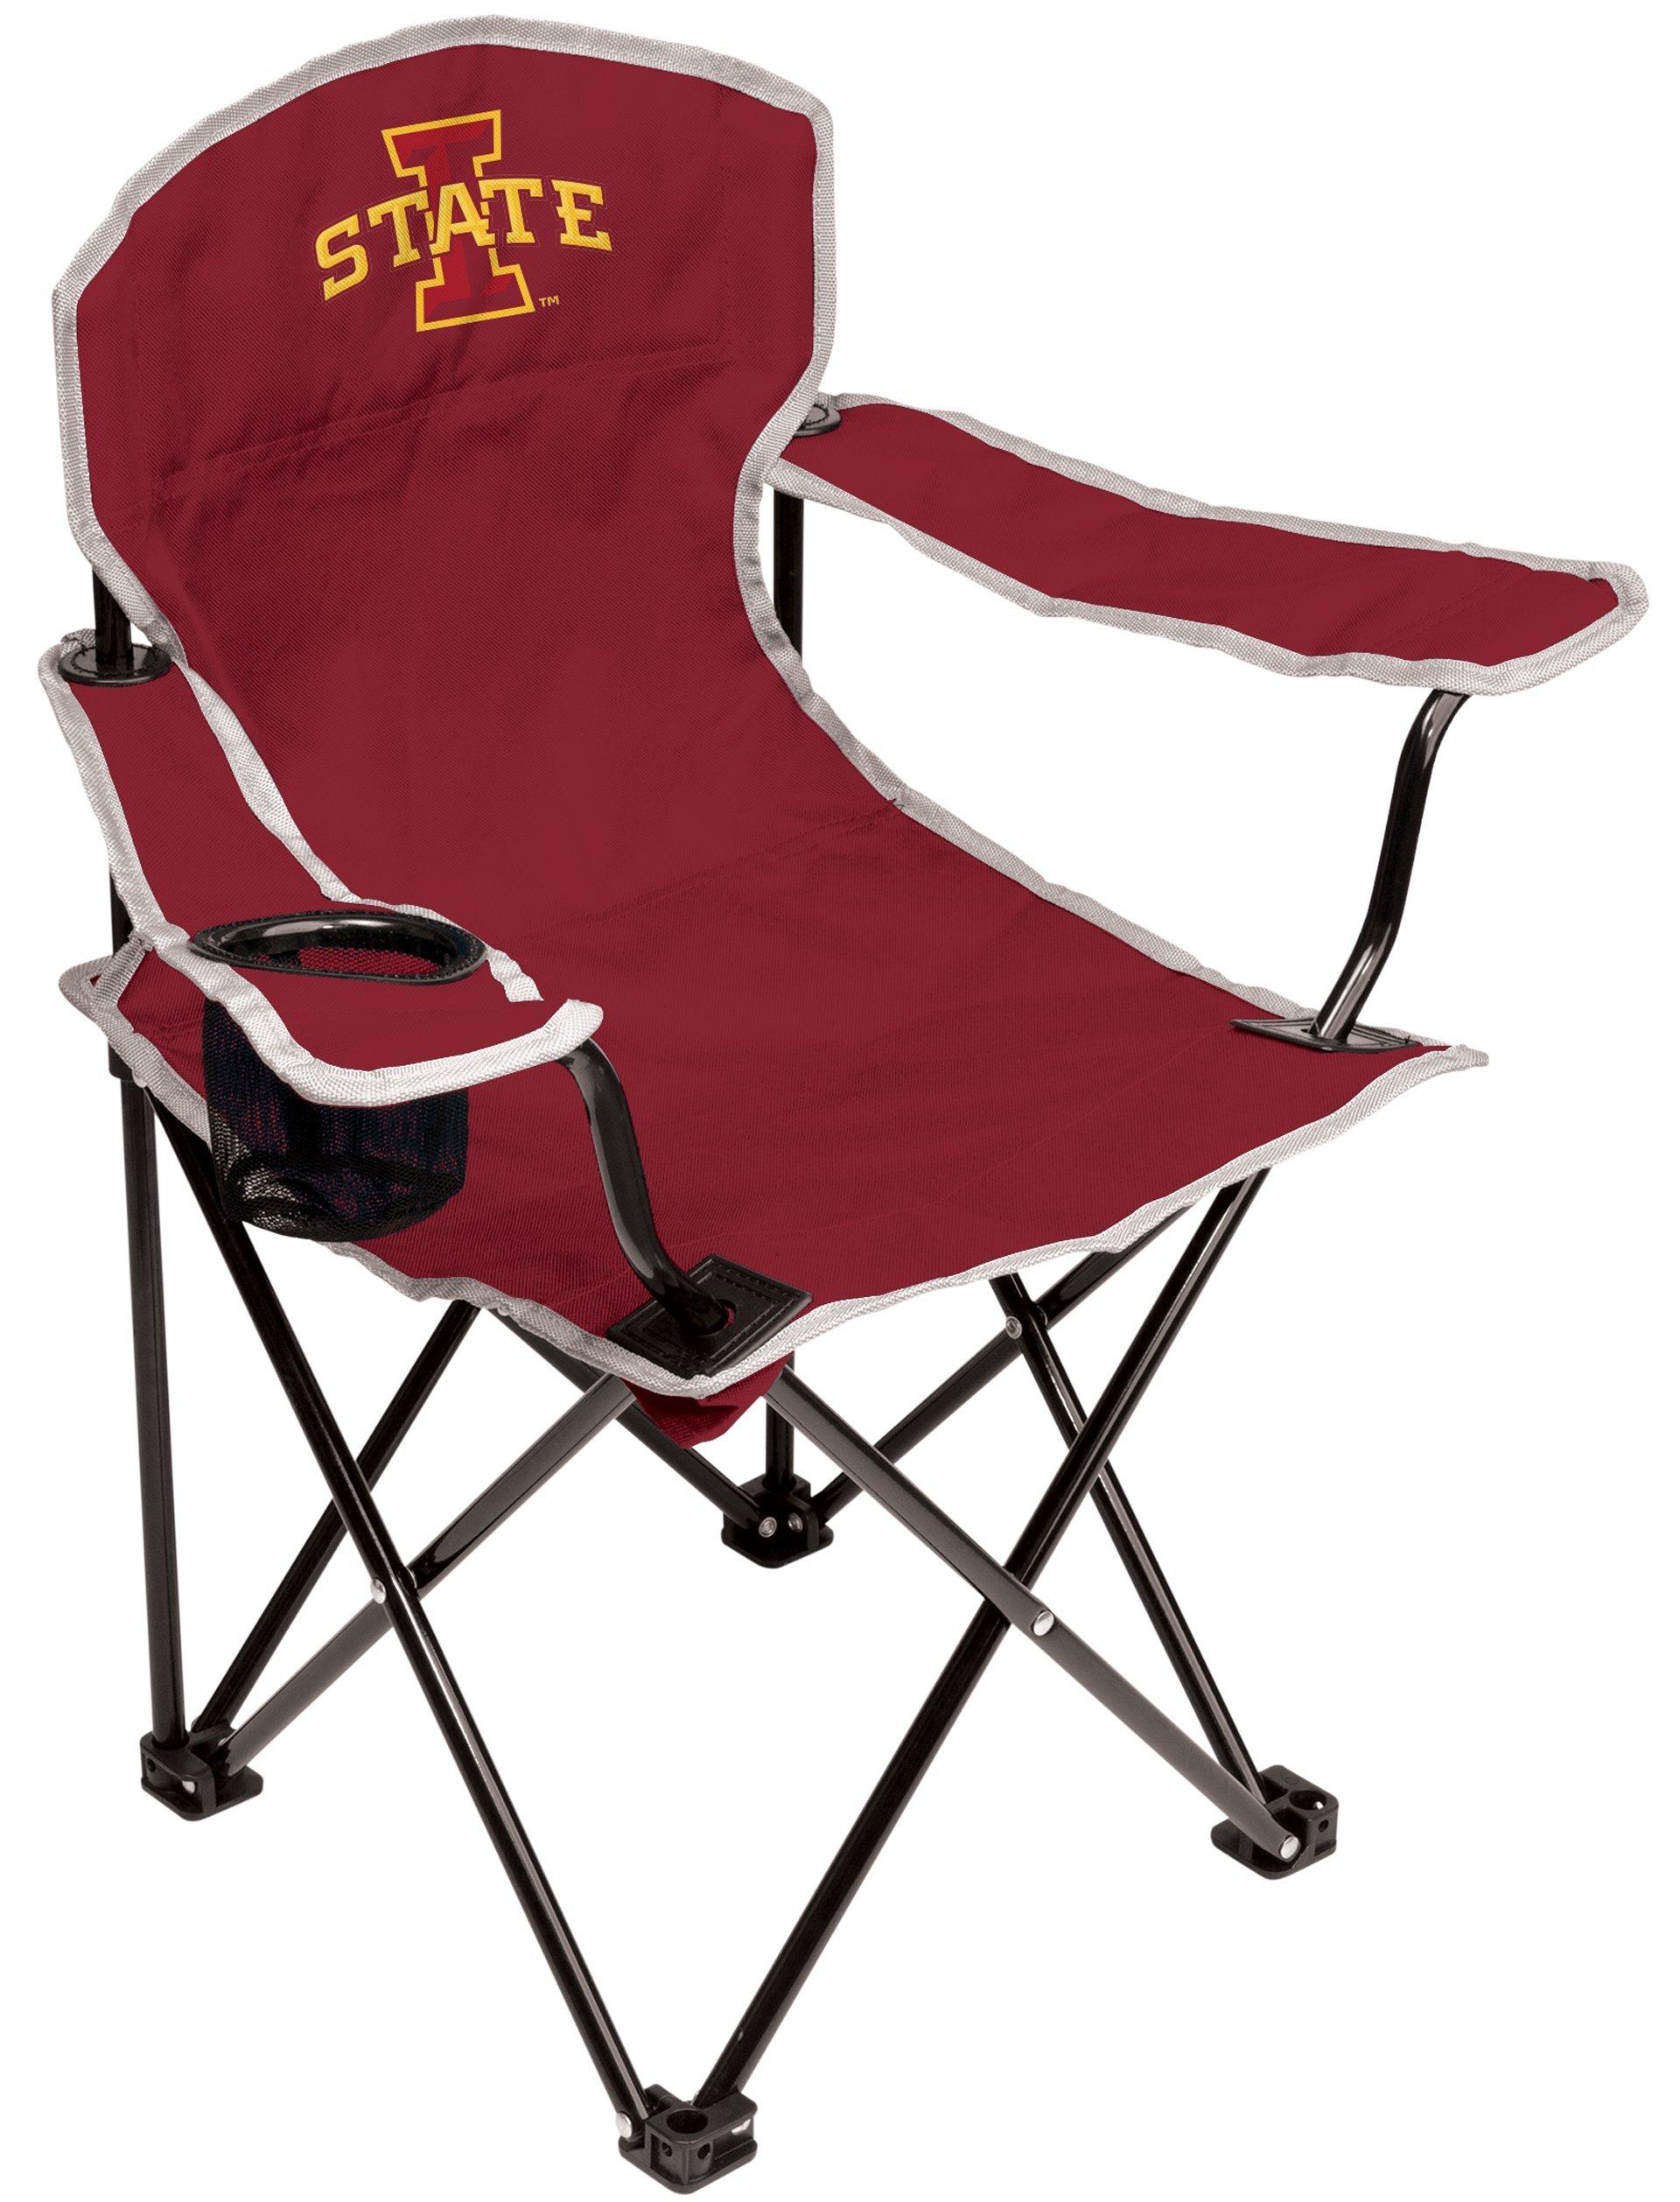 NCAA Iowa State Cyclones Youth Folding Chair, Red